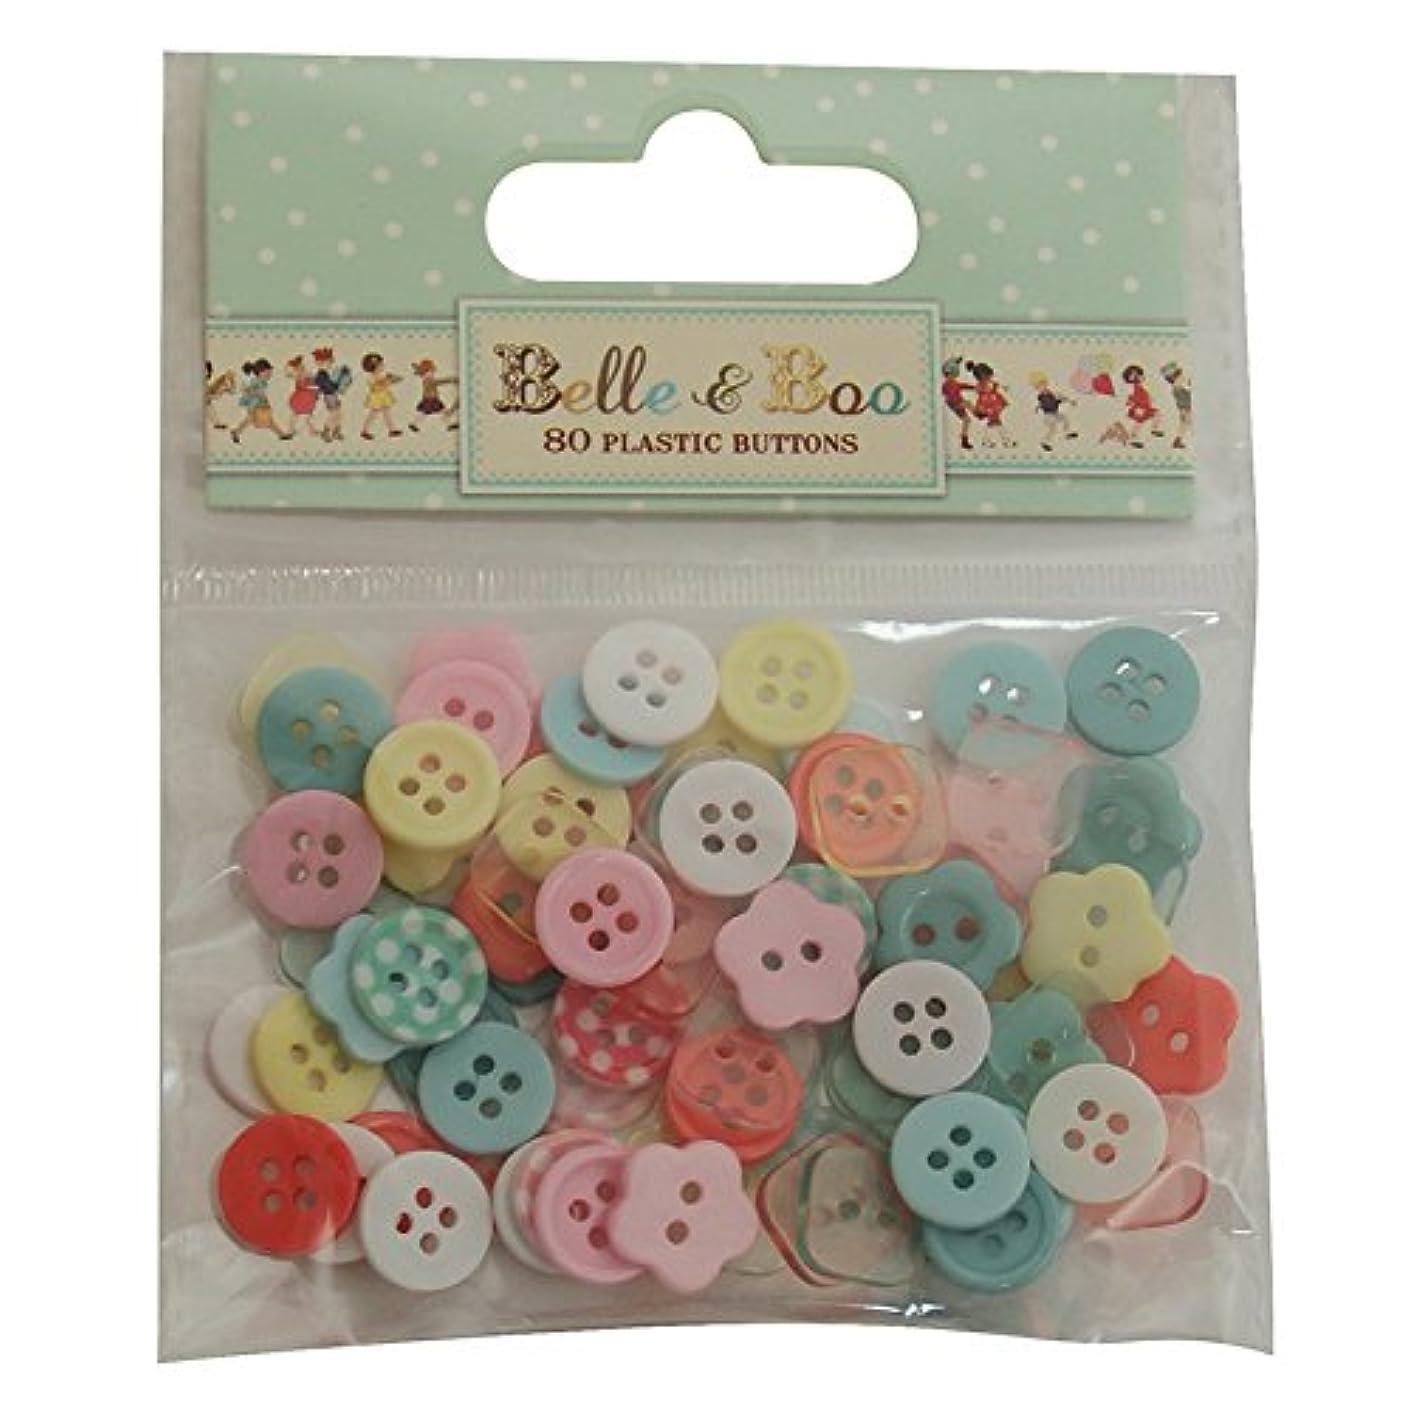 Trimcraft Belle & Boo Plastic Buttons